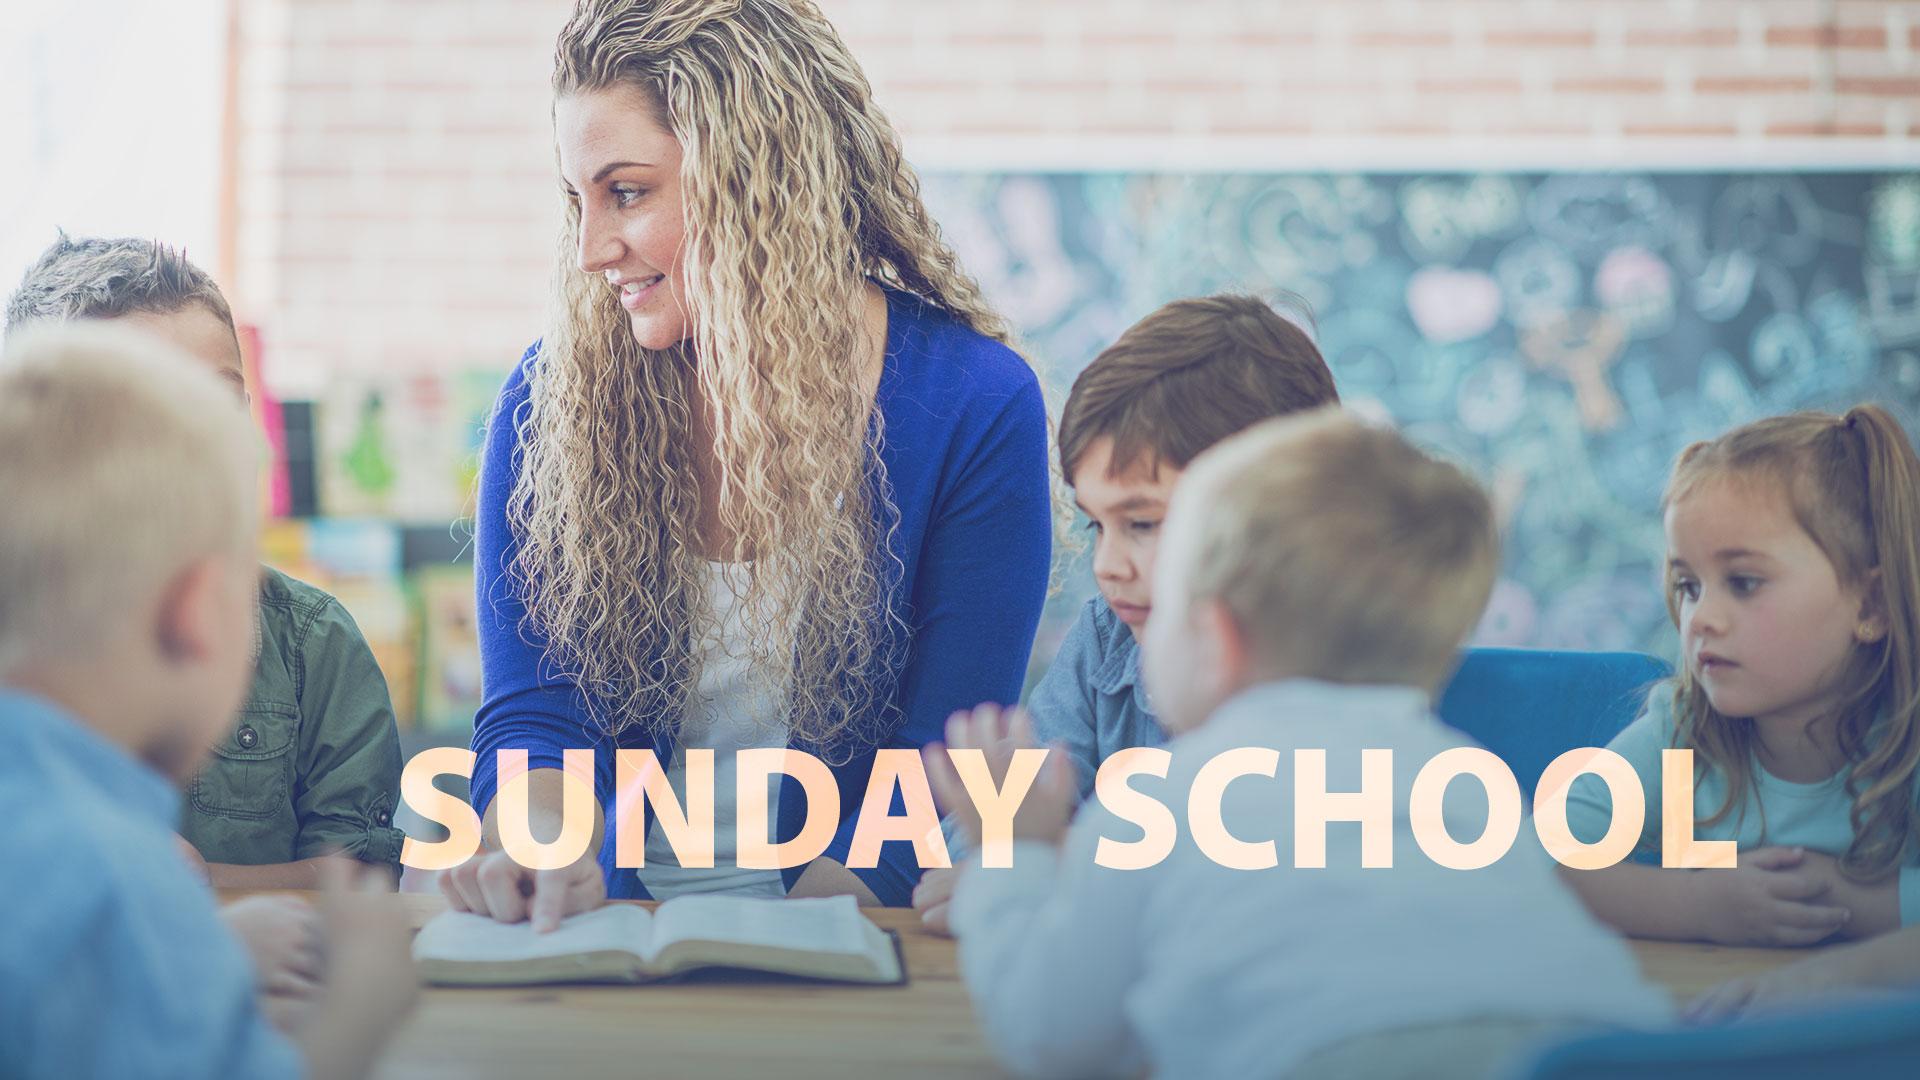 sundayschoolkids-image.jpg